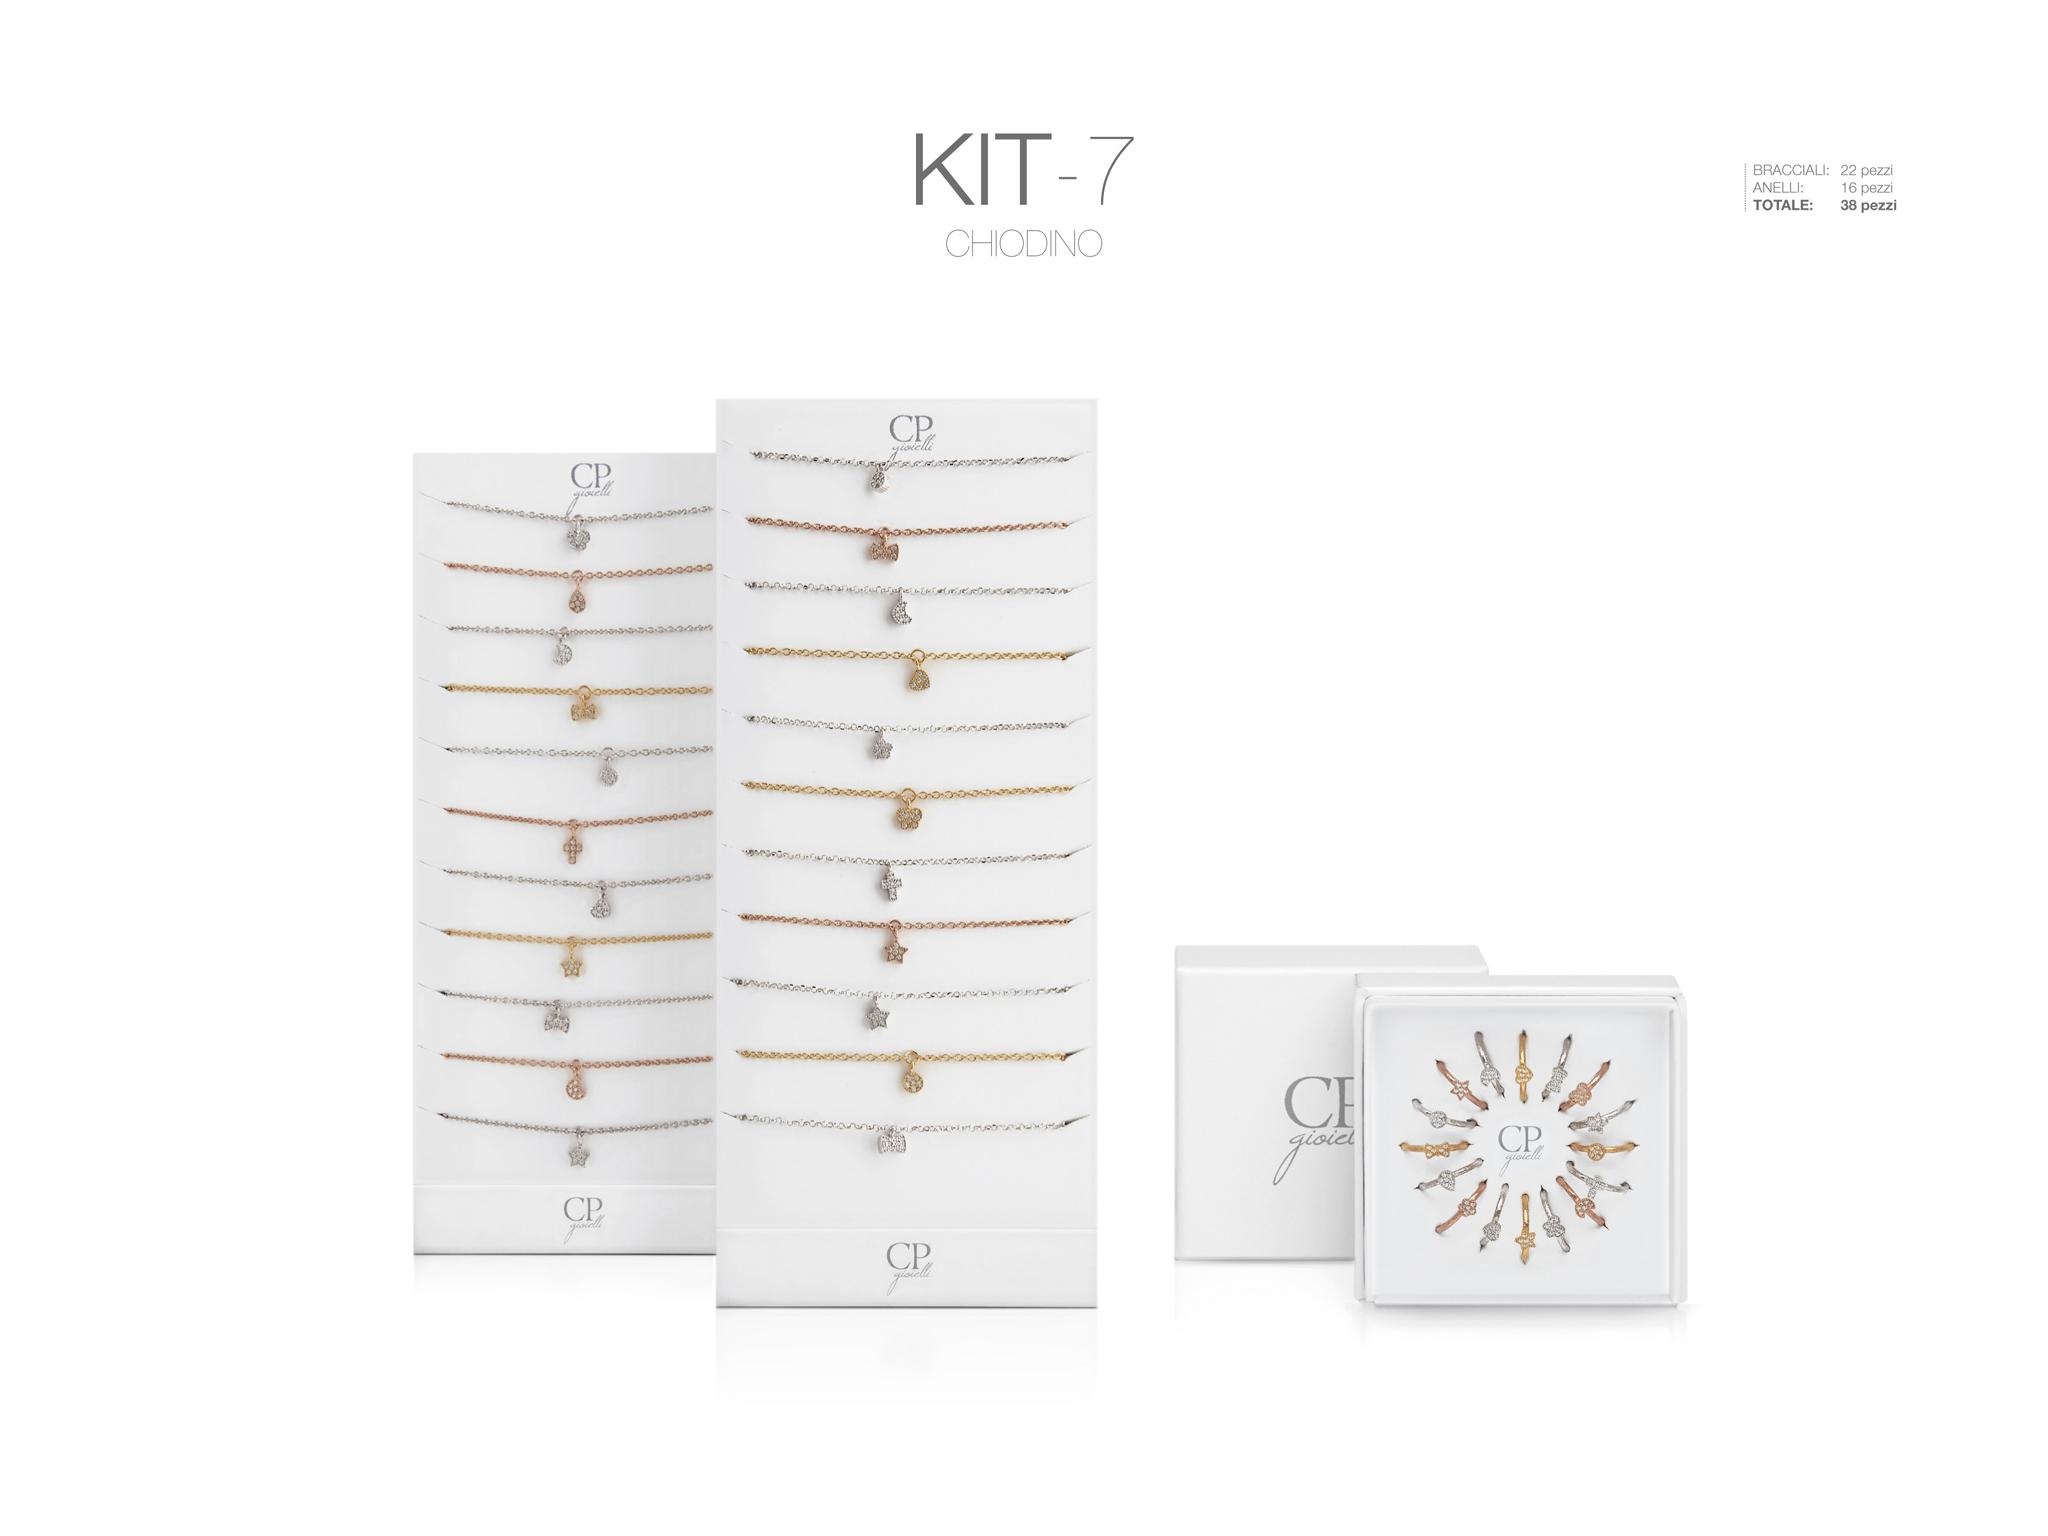 kit_argento_2-0_2016_pagina_29_app